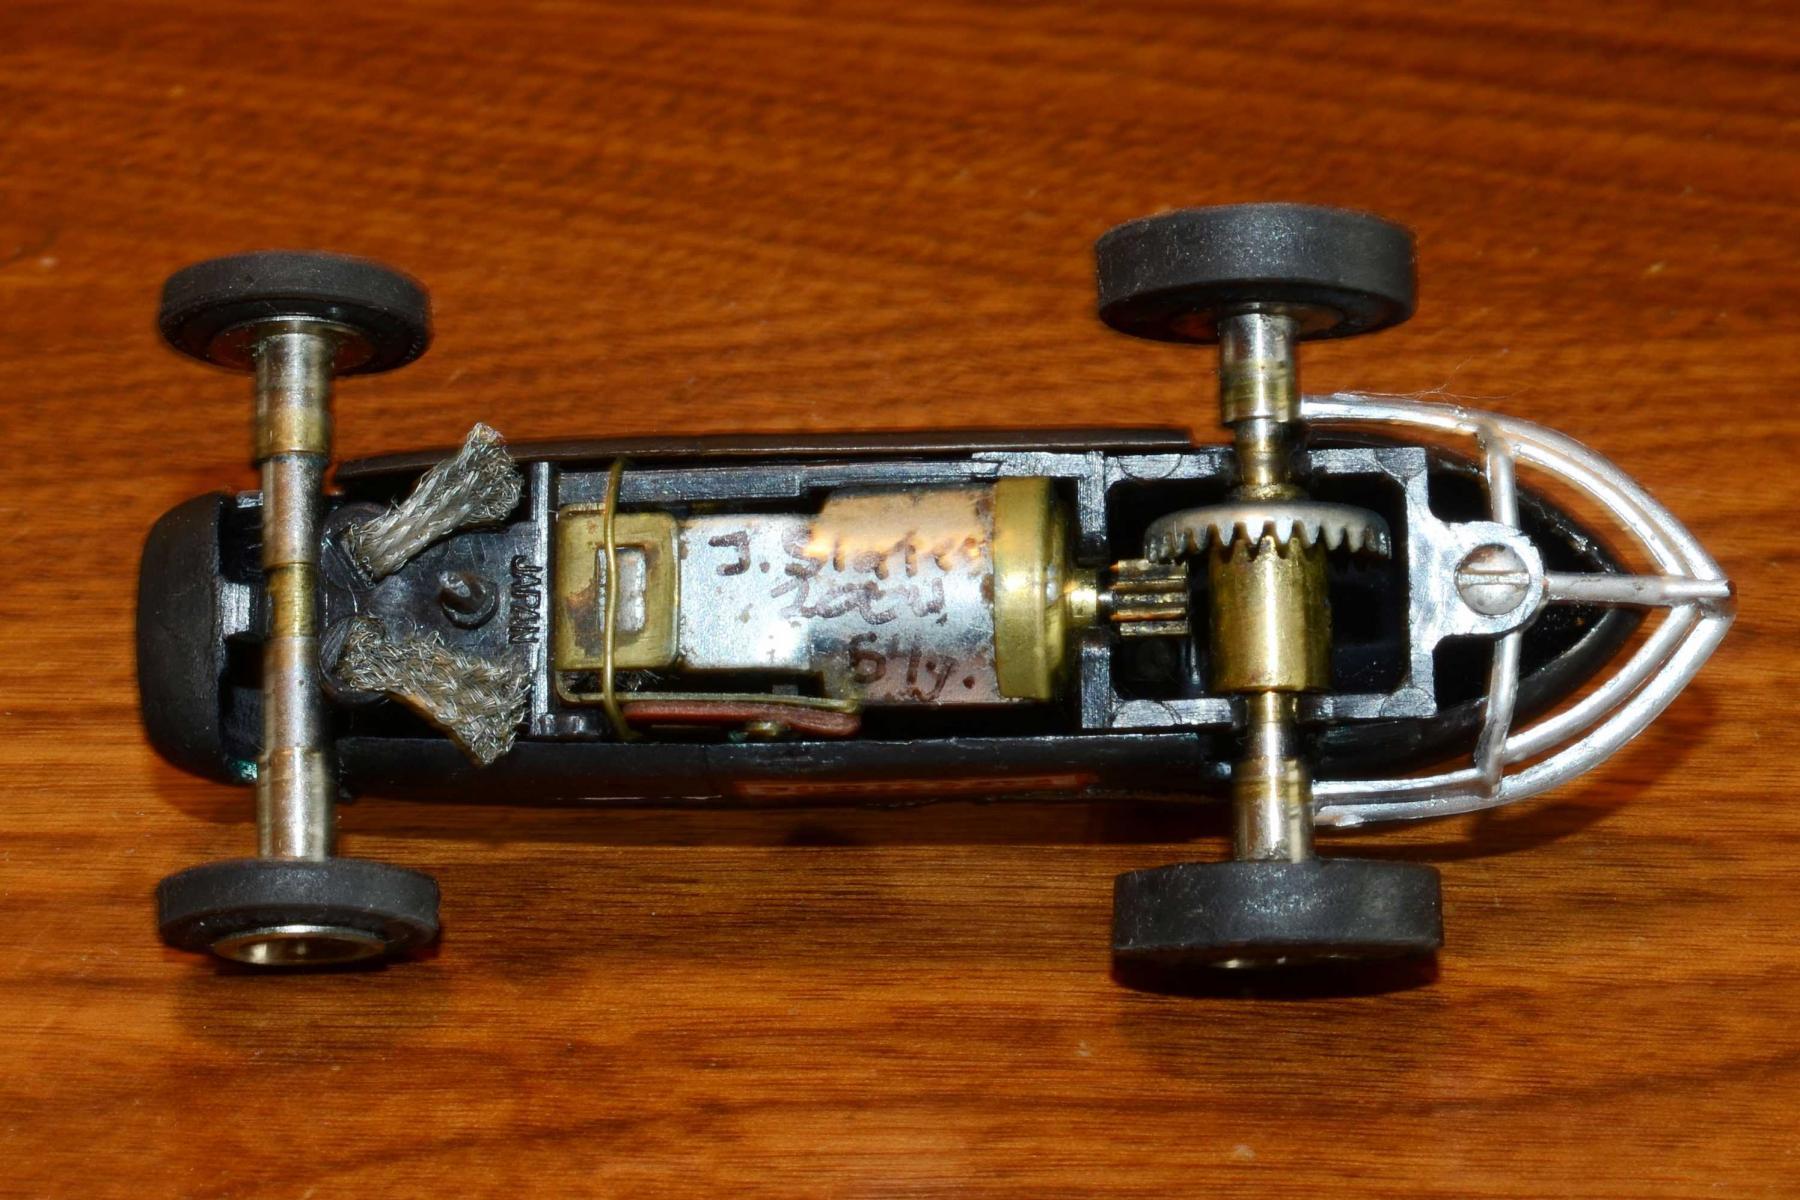 DSC_0071_Midget racer bottom size cropped_50.jpg